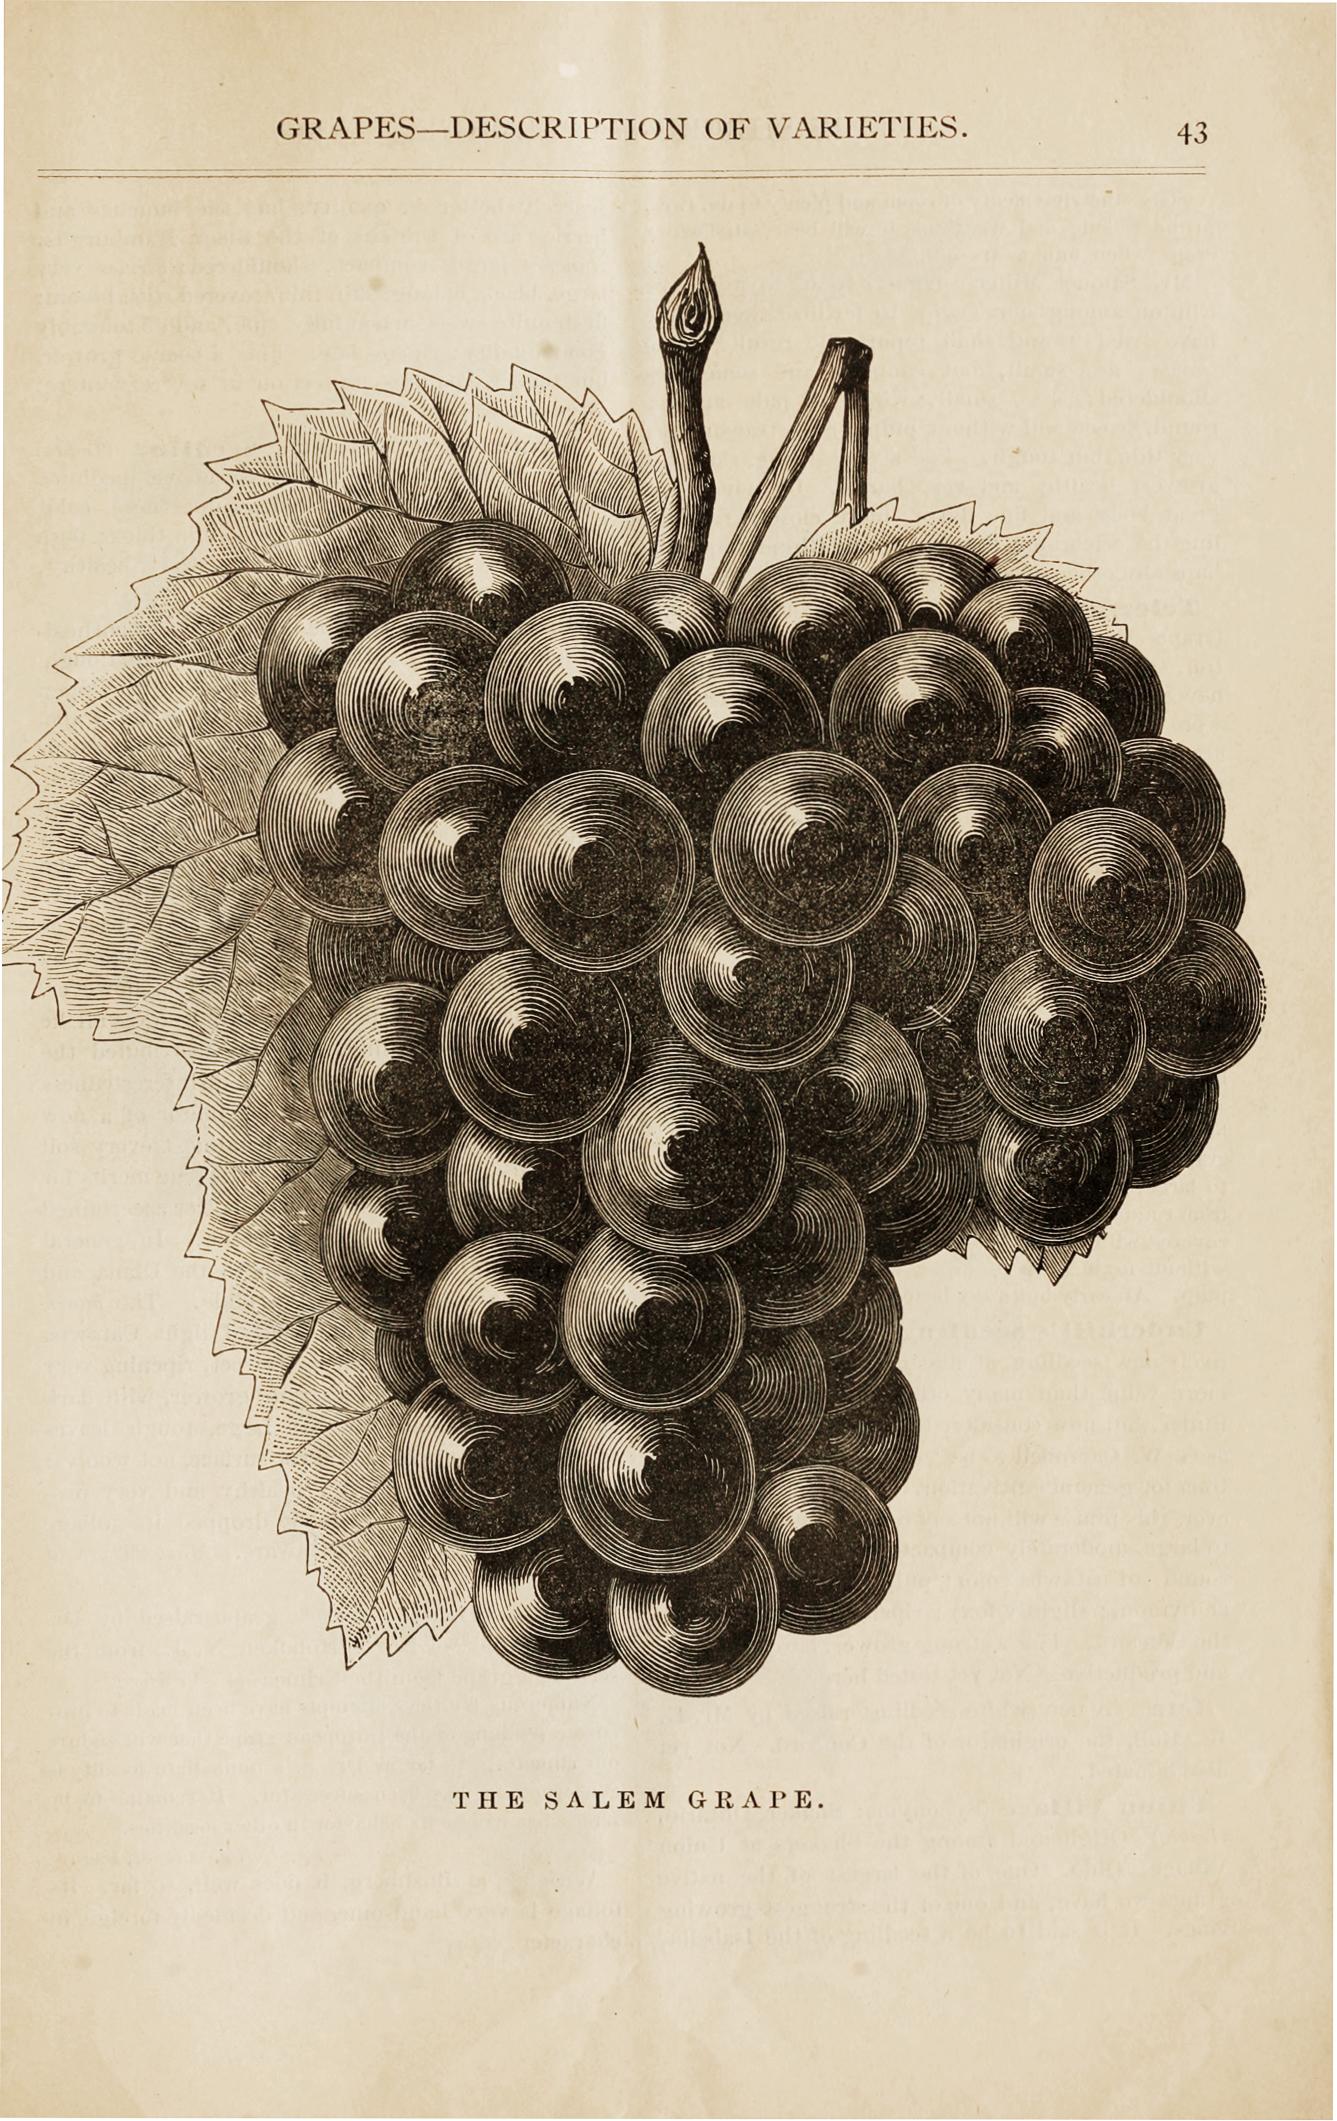 Black-and-white catalog illustration of grapes